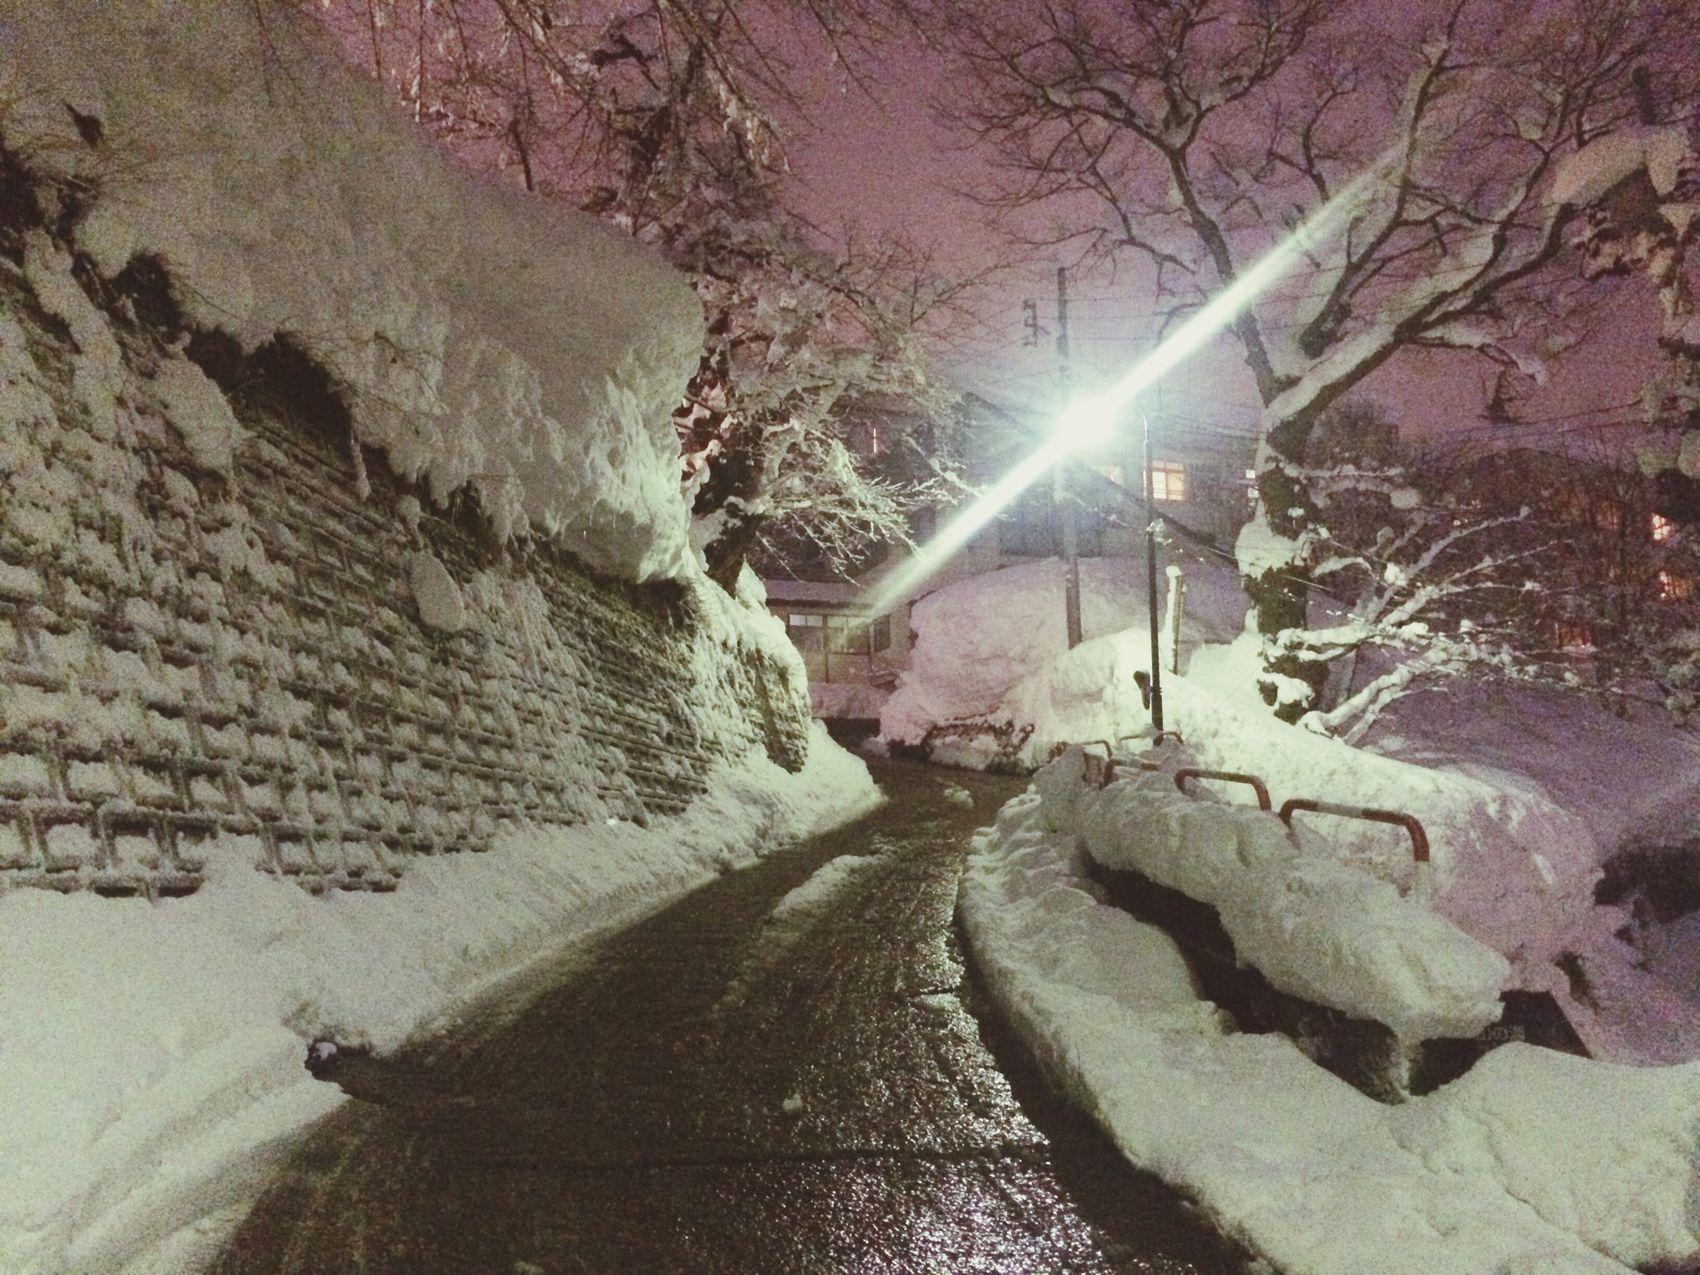 On the way to my favorite onsen. YUZAWA Snow